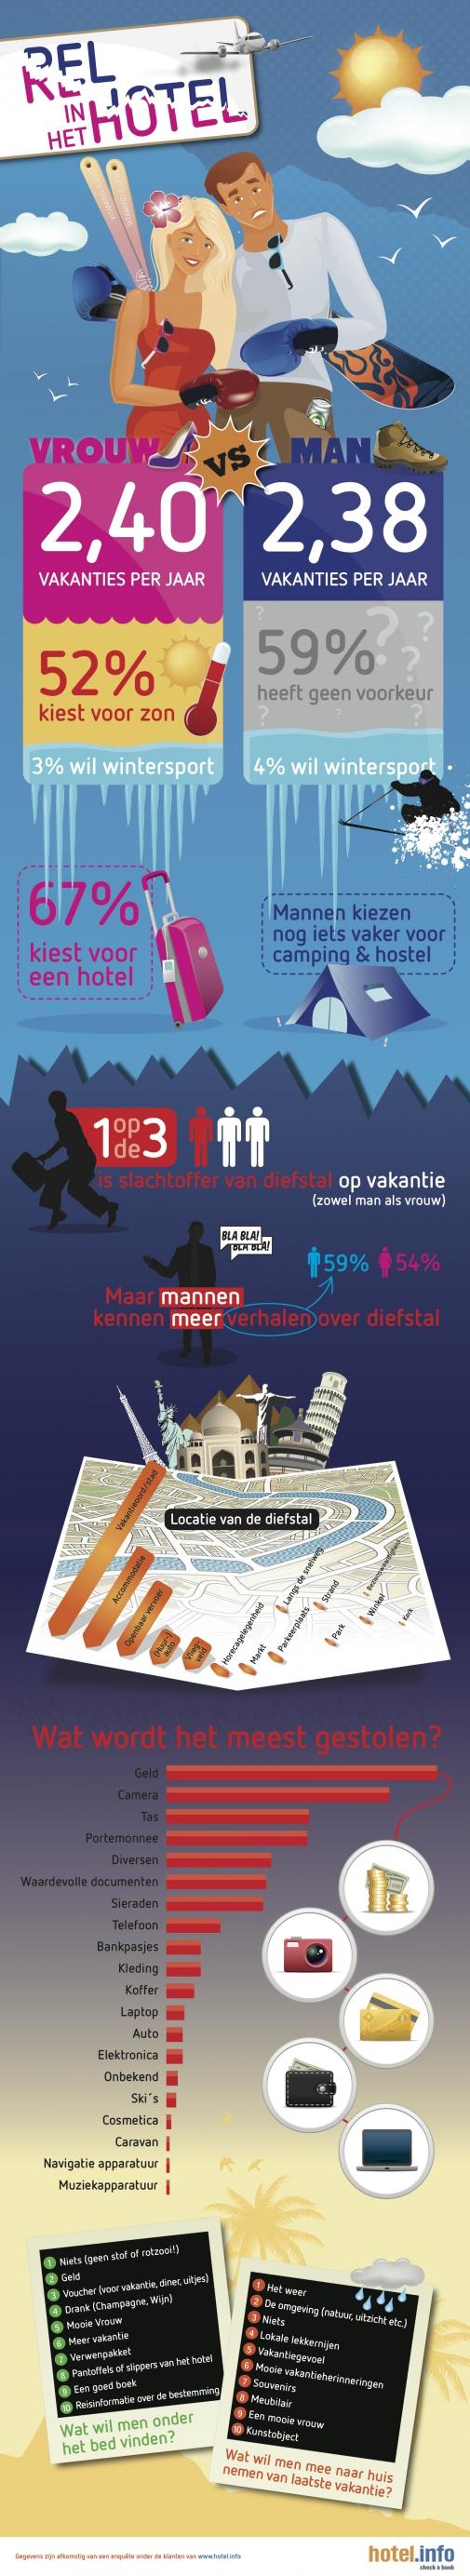 Infographic_HotelInfo[1].jpg